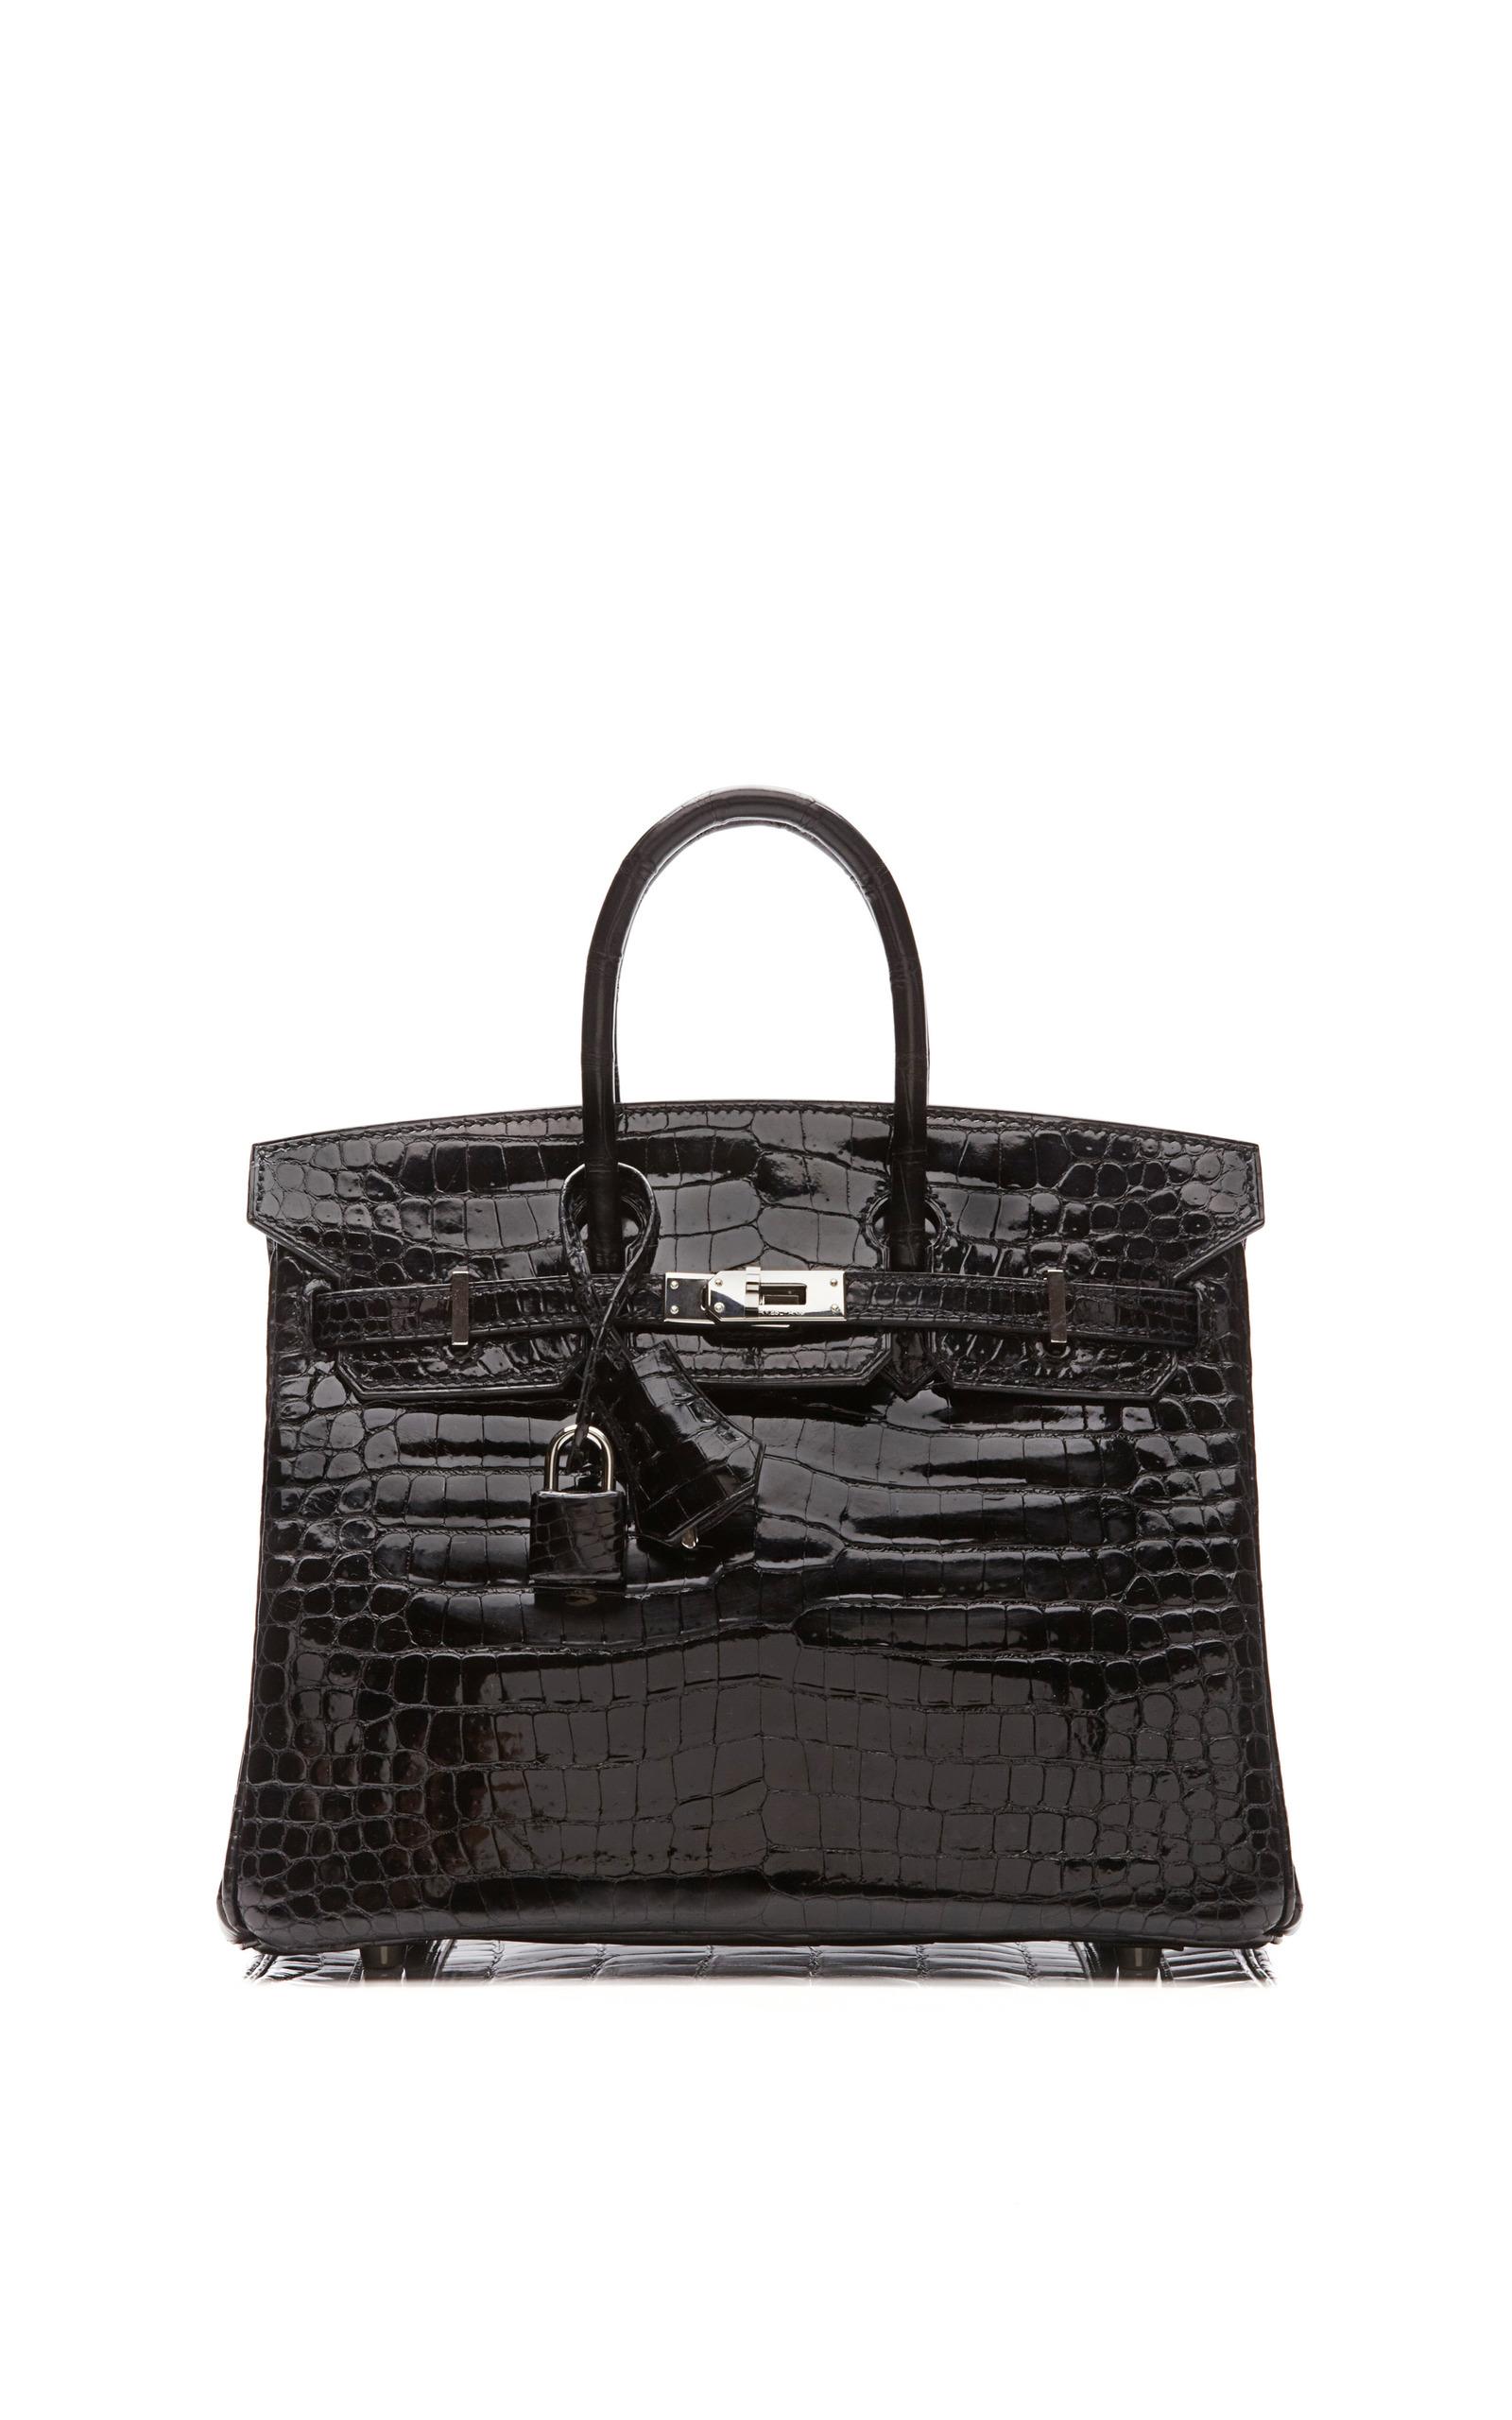 2a027427eb Hermes Vintage25Cm Shiny Black Porosus Crocodile Birkin. CLOSE. Loading